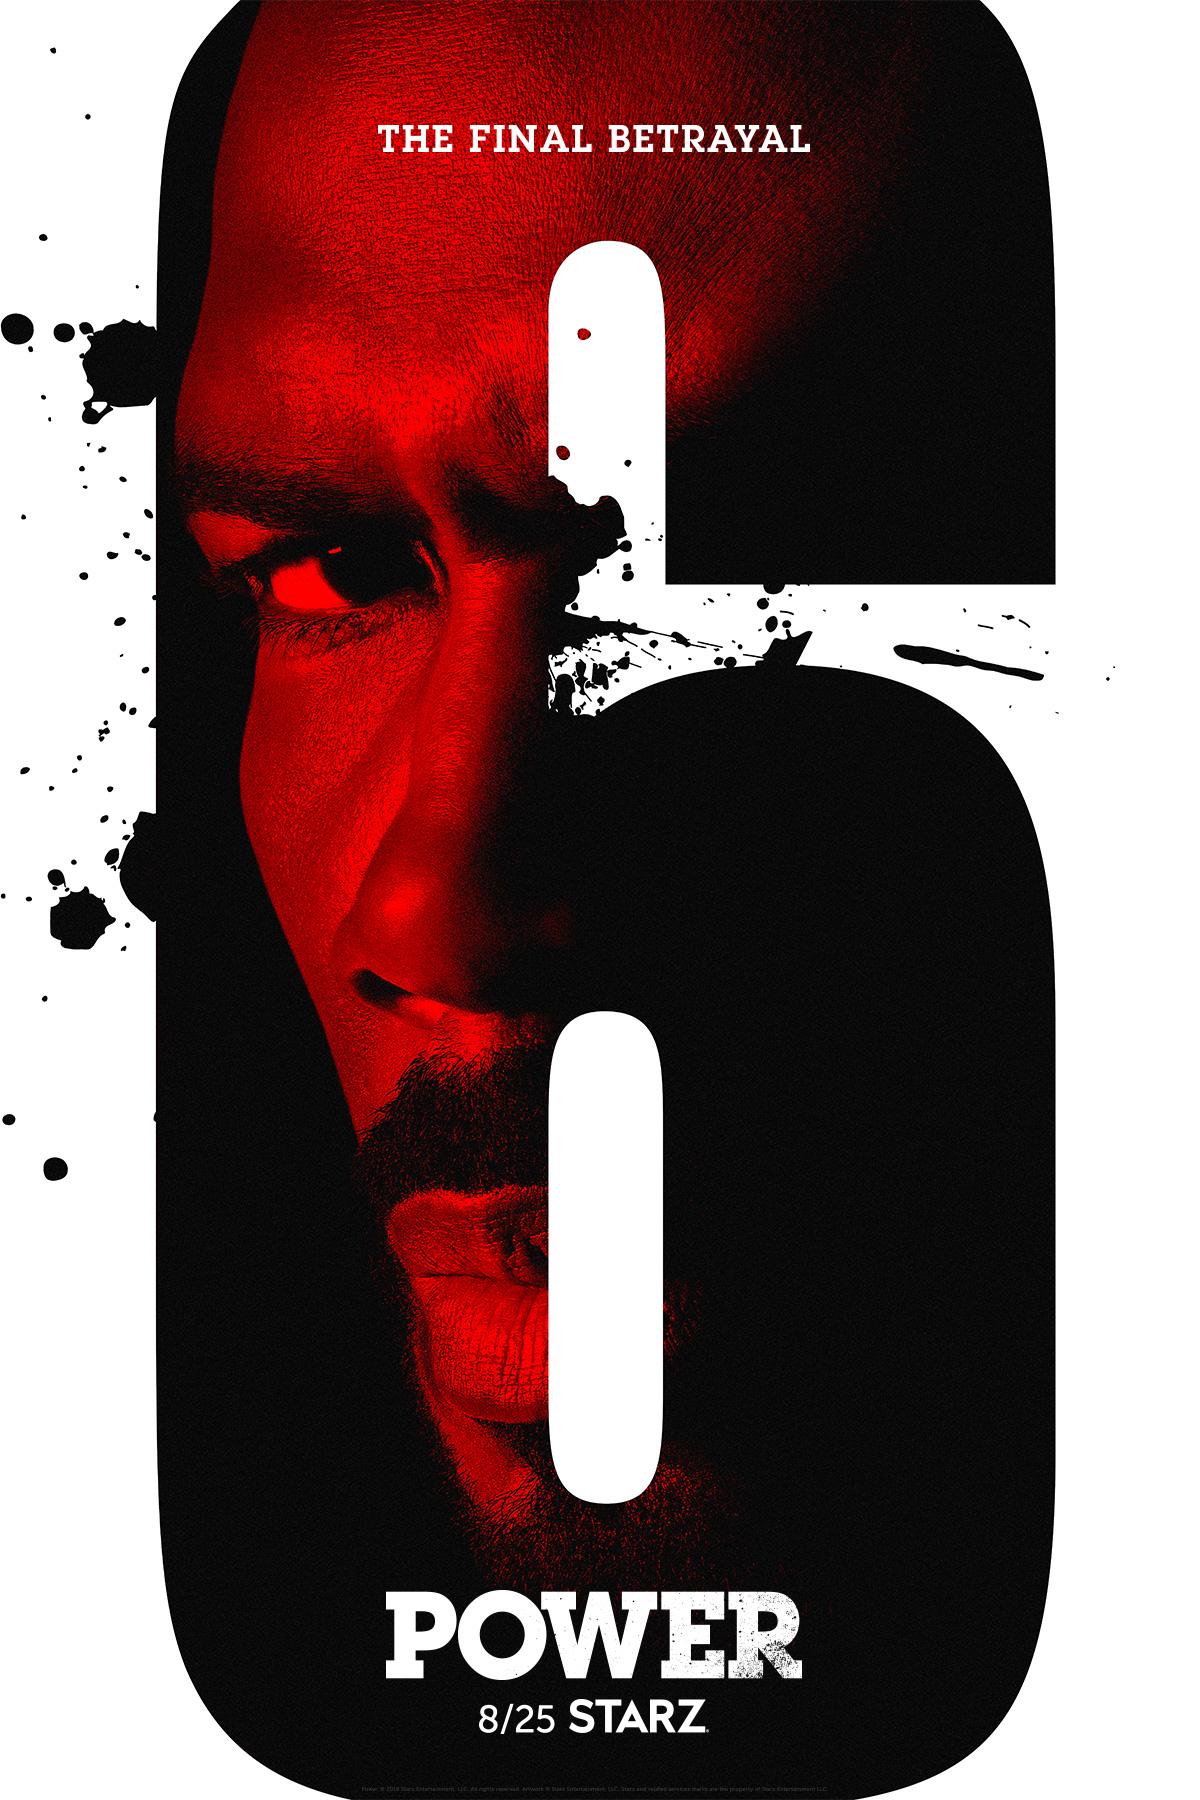 Power Season 6: Release Date, Cast, Trailer, and News - Den of Geek